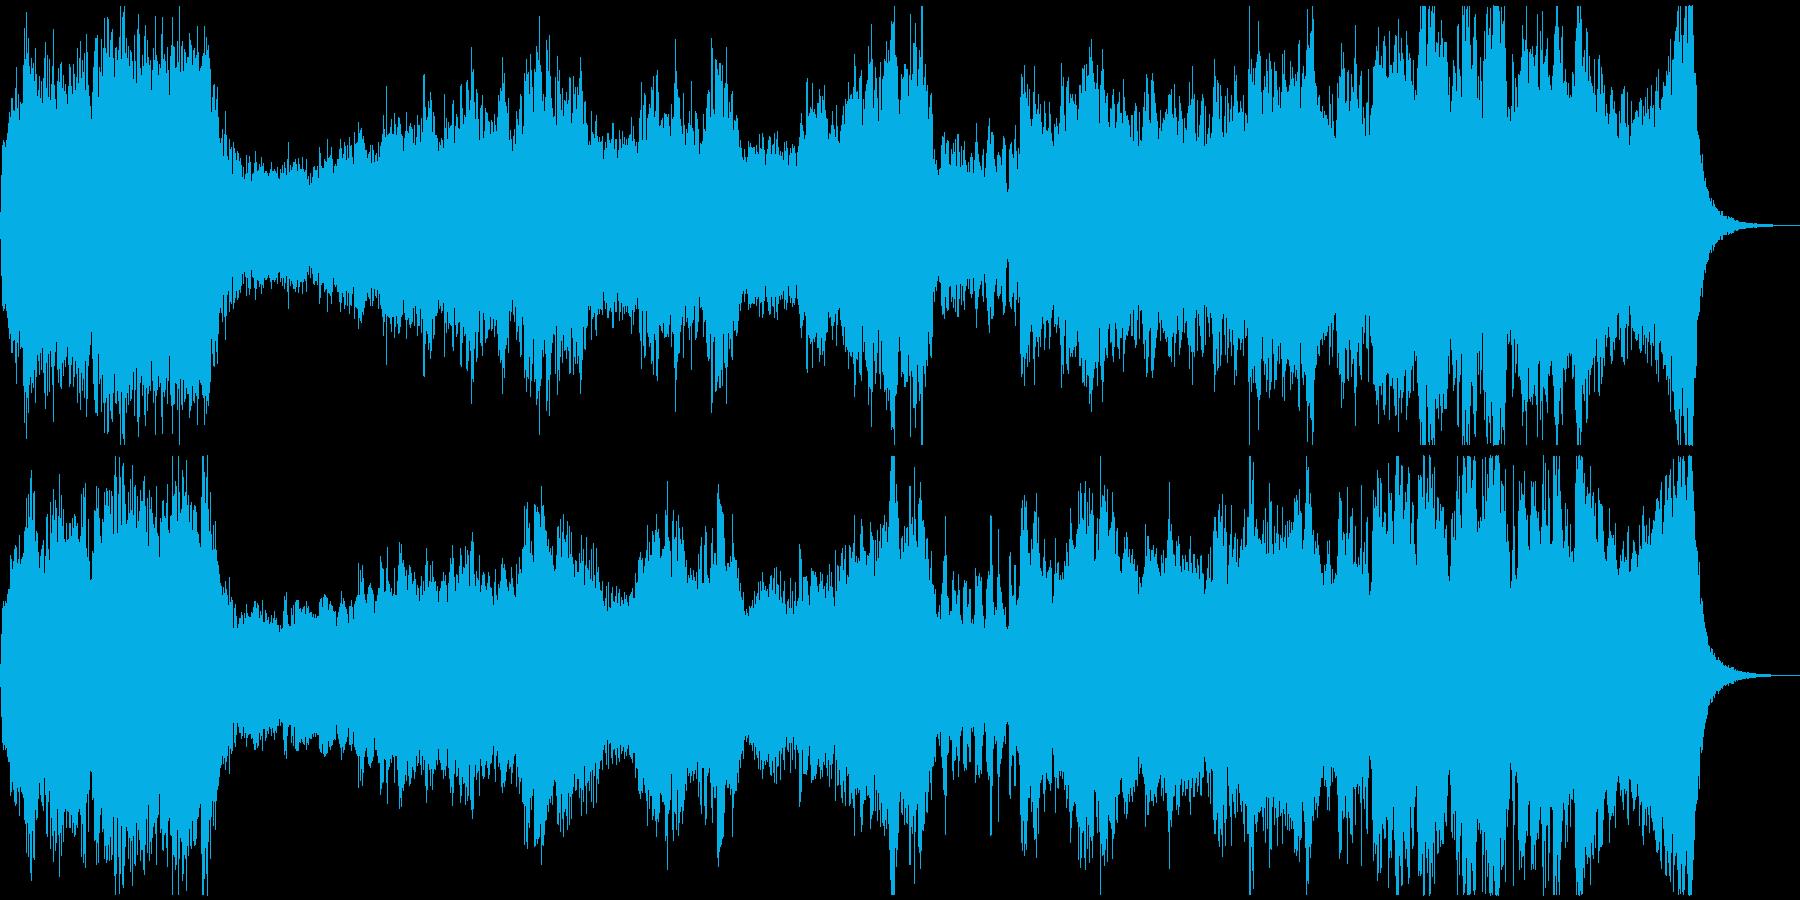 FANTASYLANDの再生済みの波形